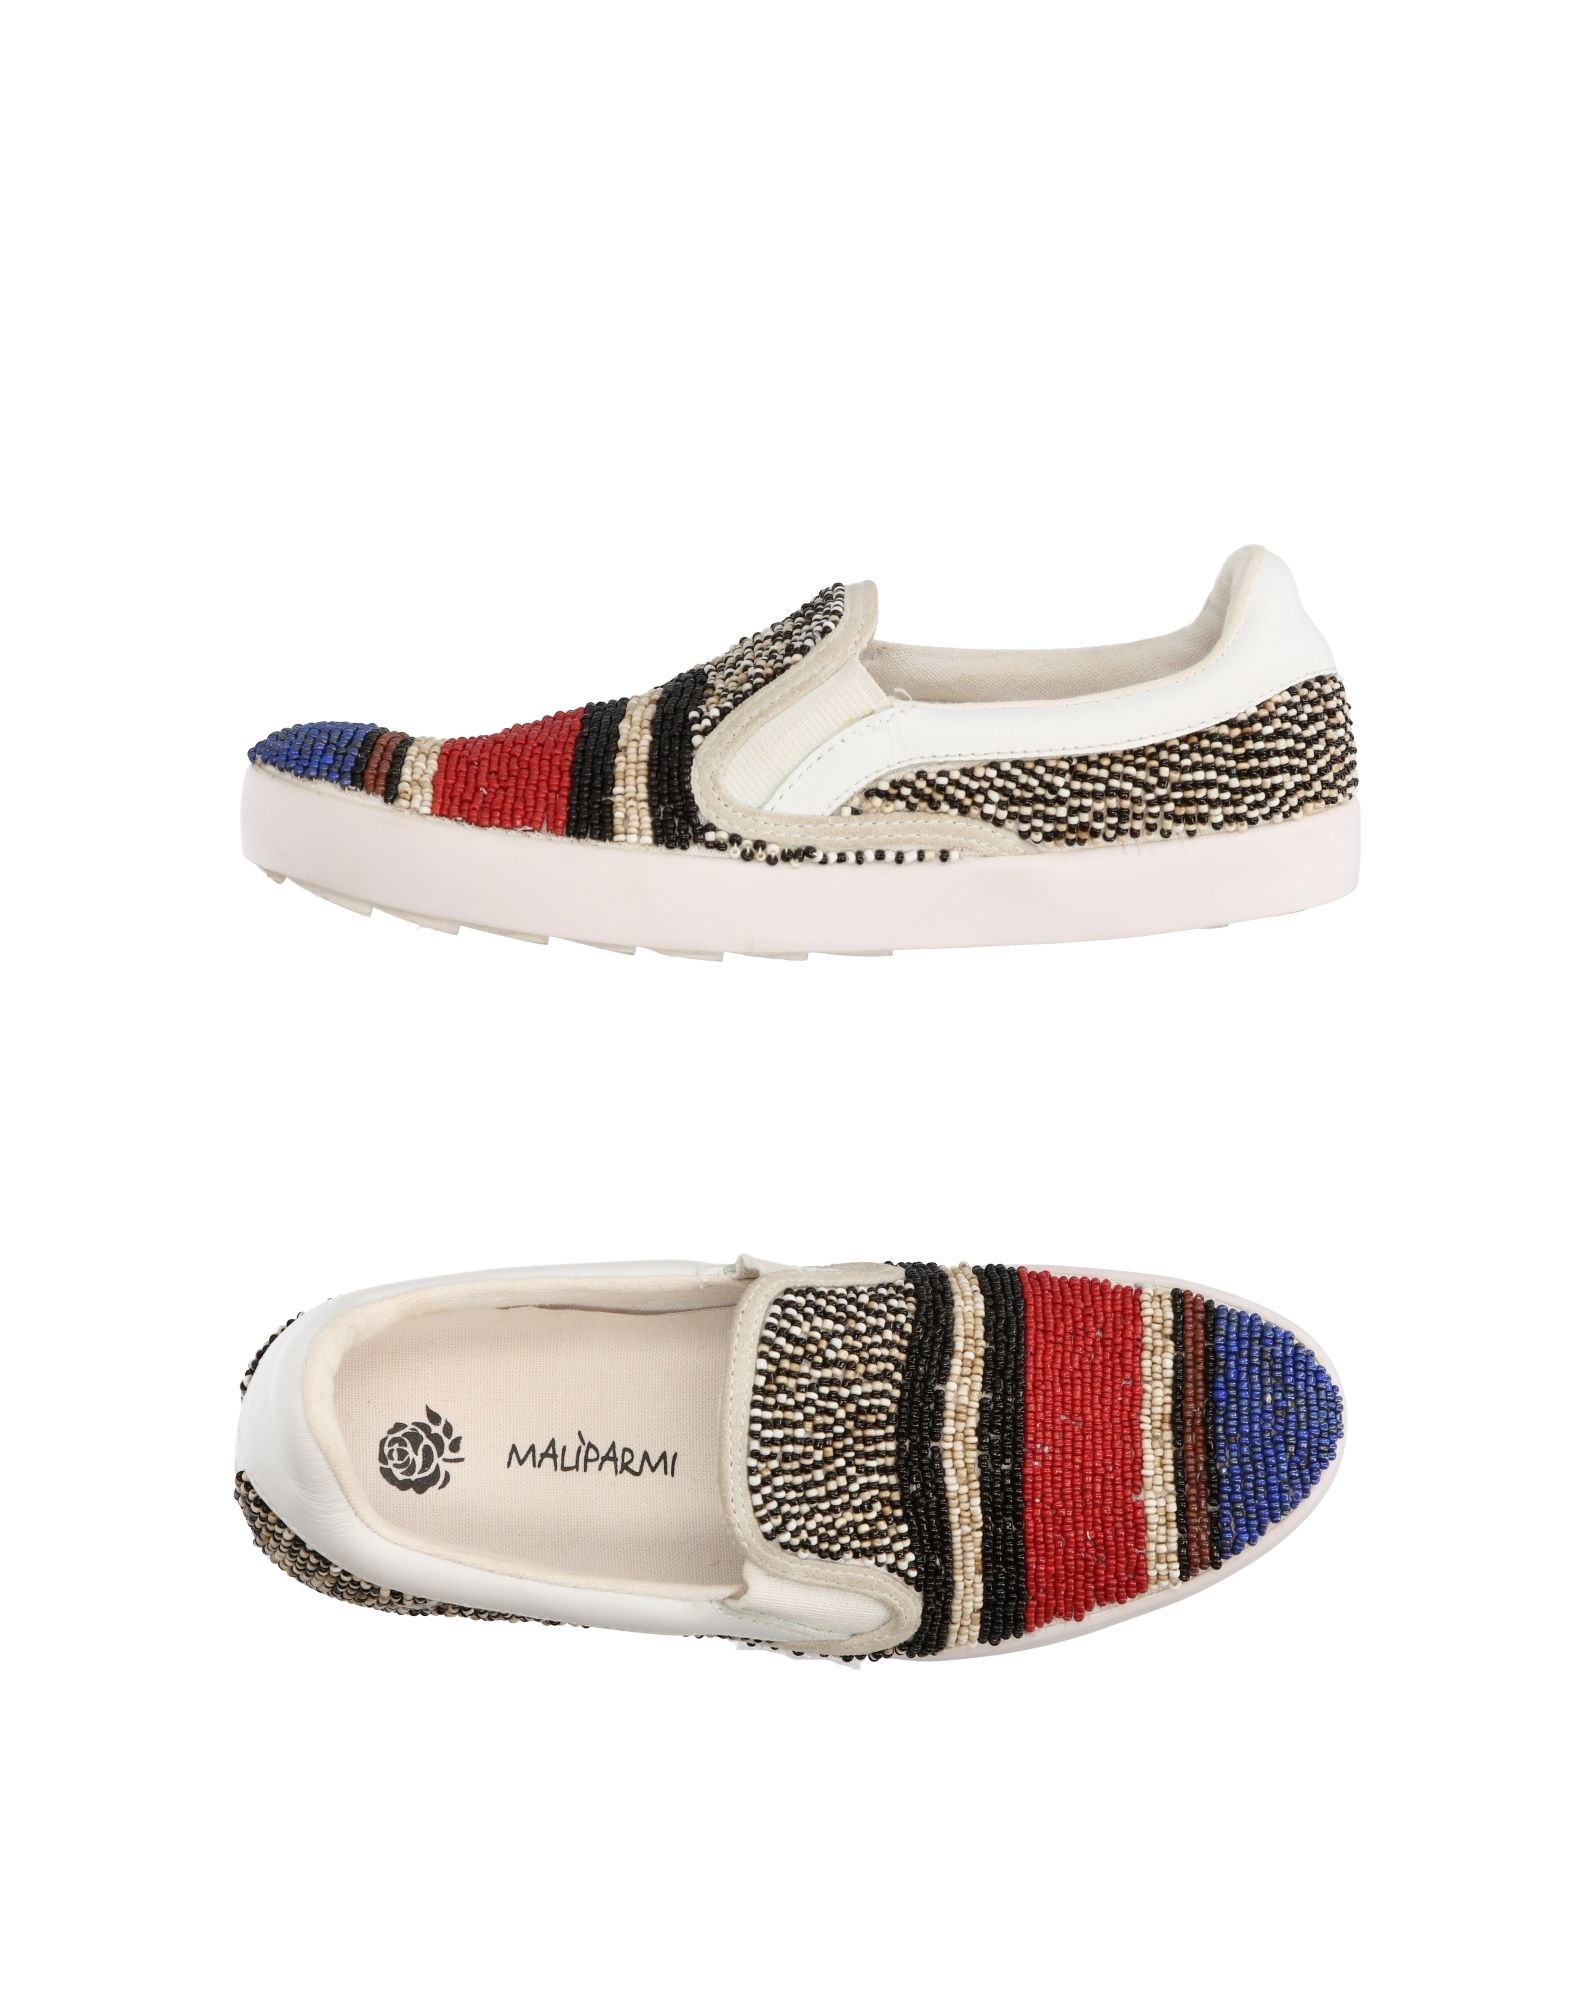 Malìparmi Sneakers Damen  11264040PV Gute Qualität beliebte Schuhe